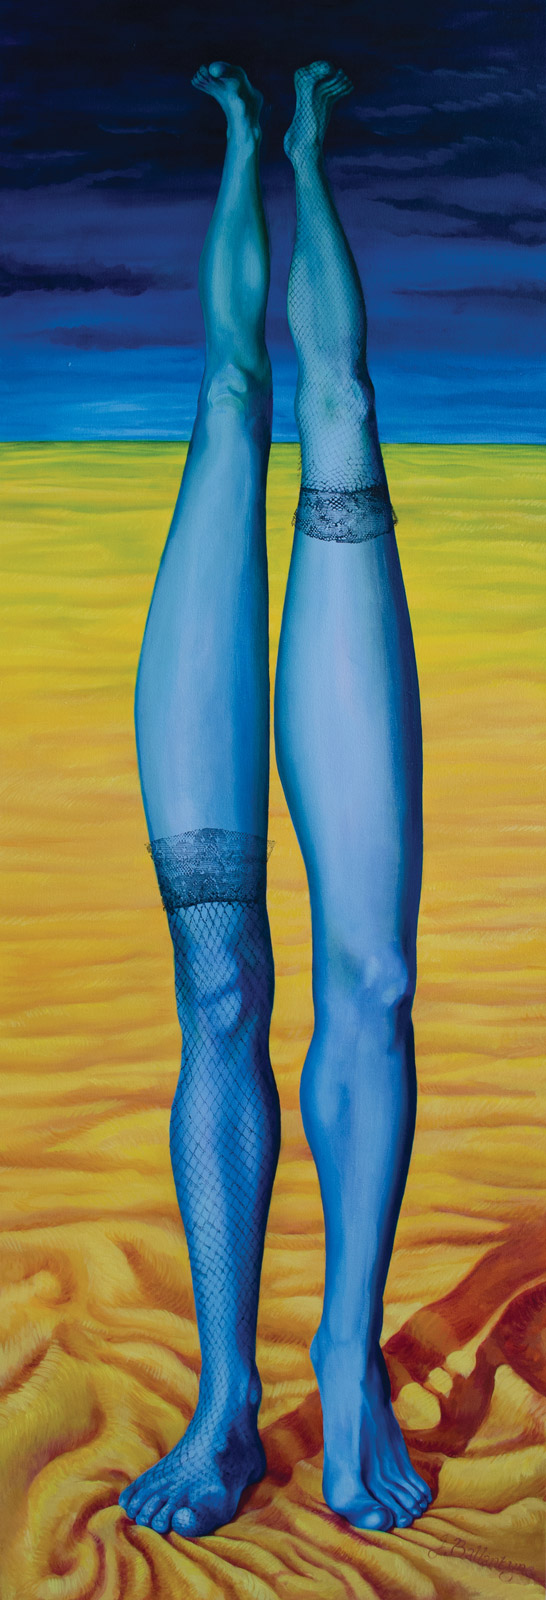 Legs That Go!